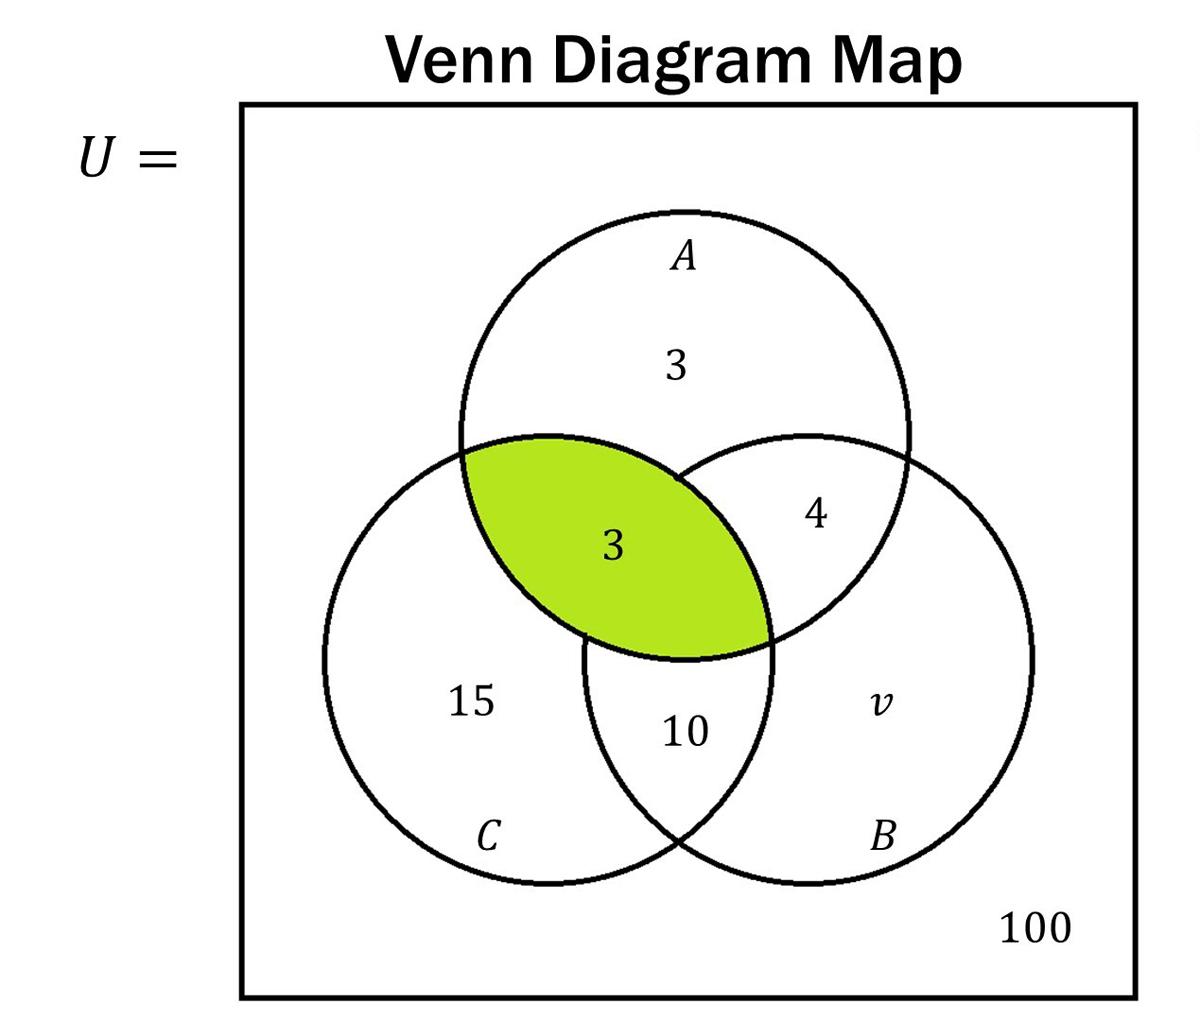 Venn Diagram Problems Examples